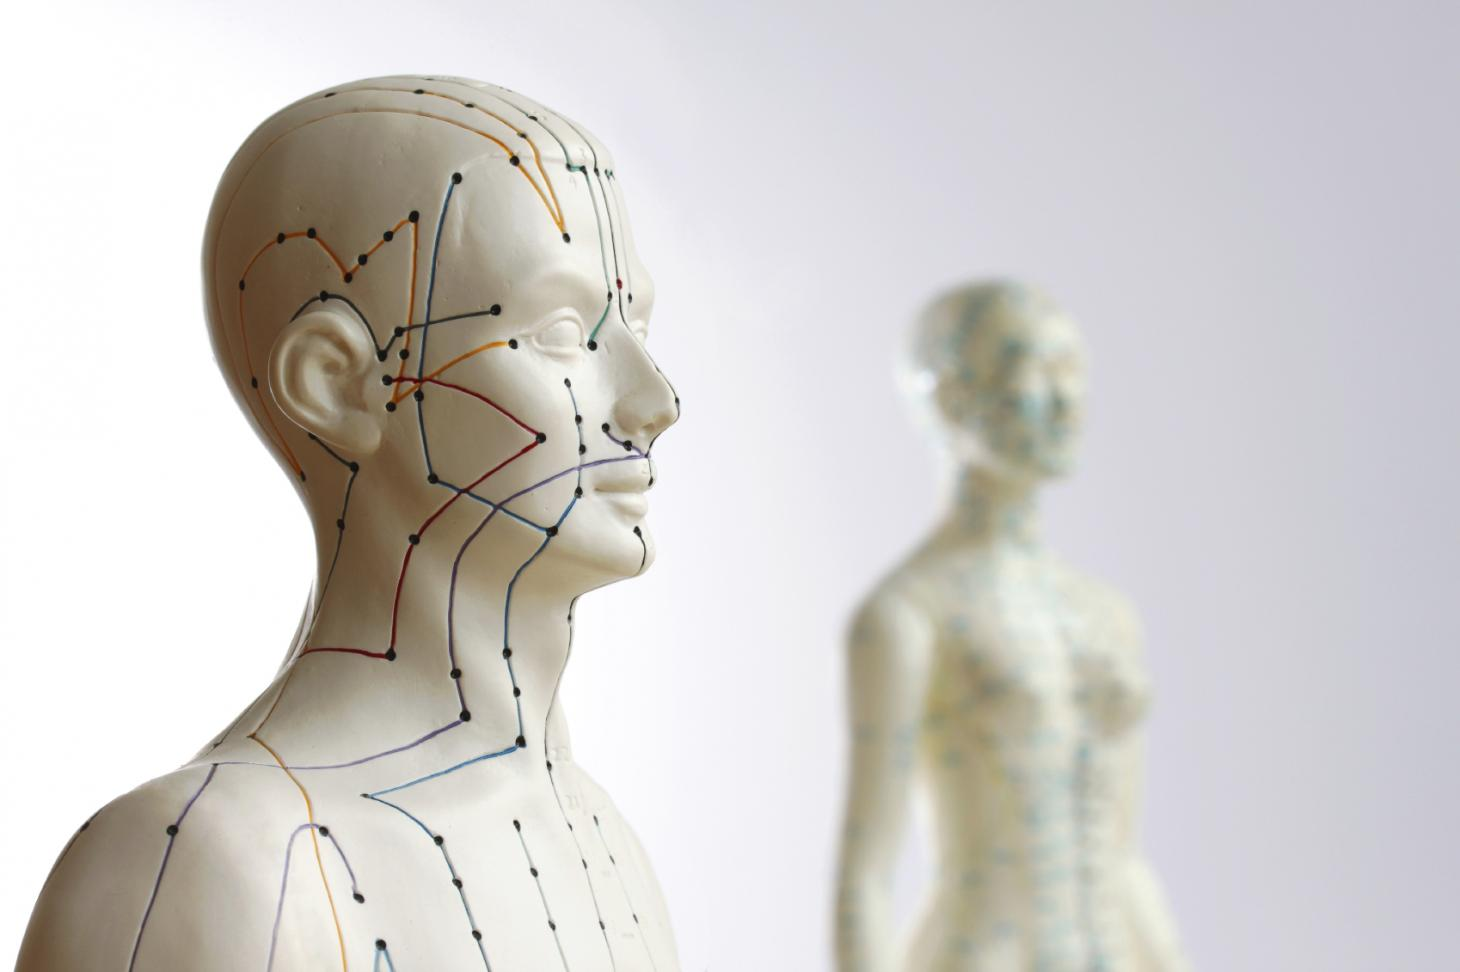 Acupuncture Meridian Lines